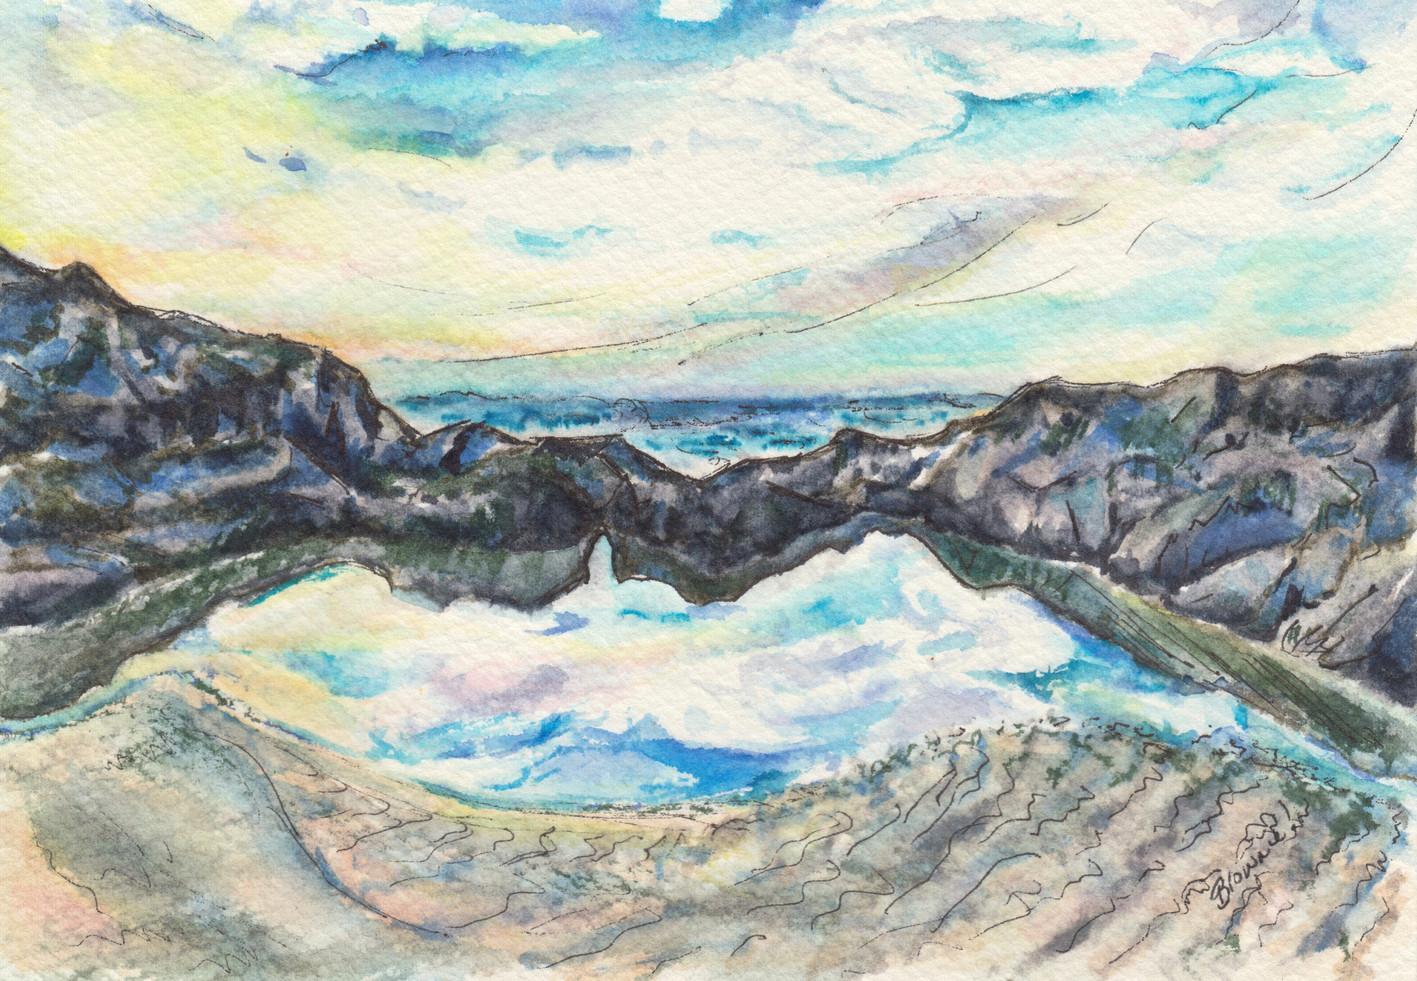 Tofino Seashore: Item # - A45